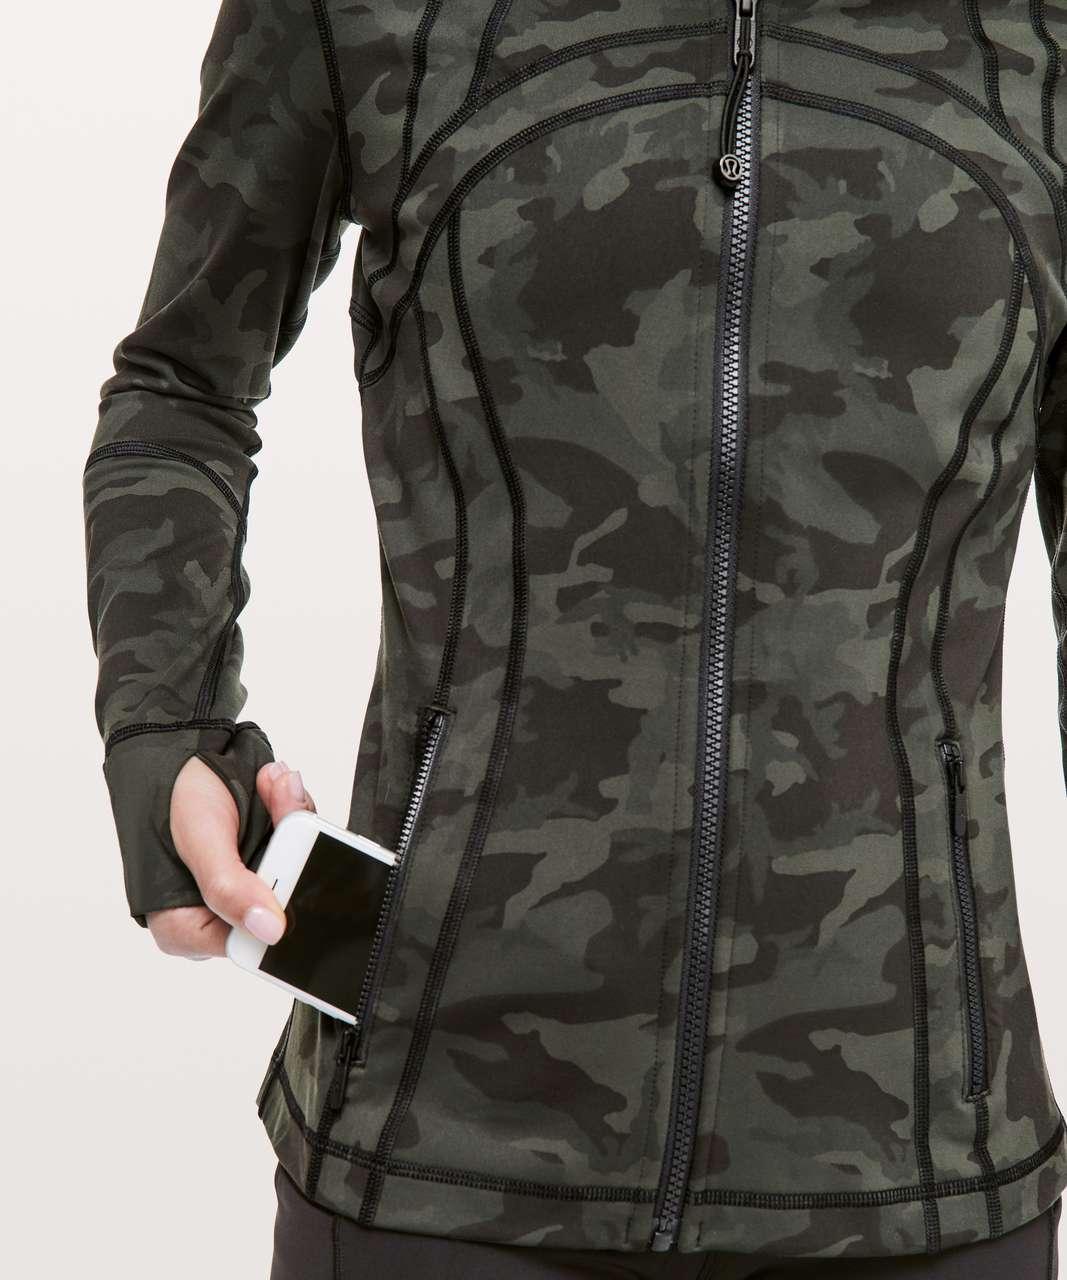 Lululemon Define Jacket - Incognito Camo Multi Gator Green